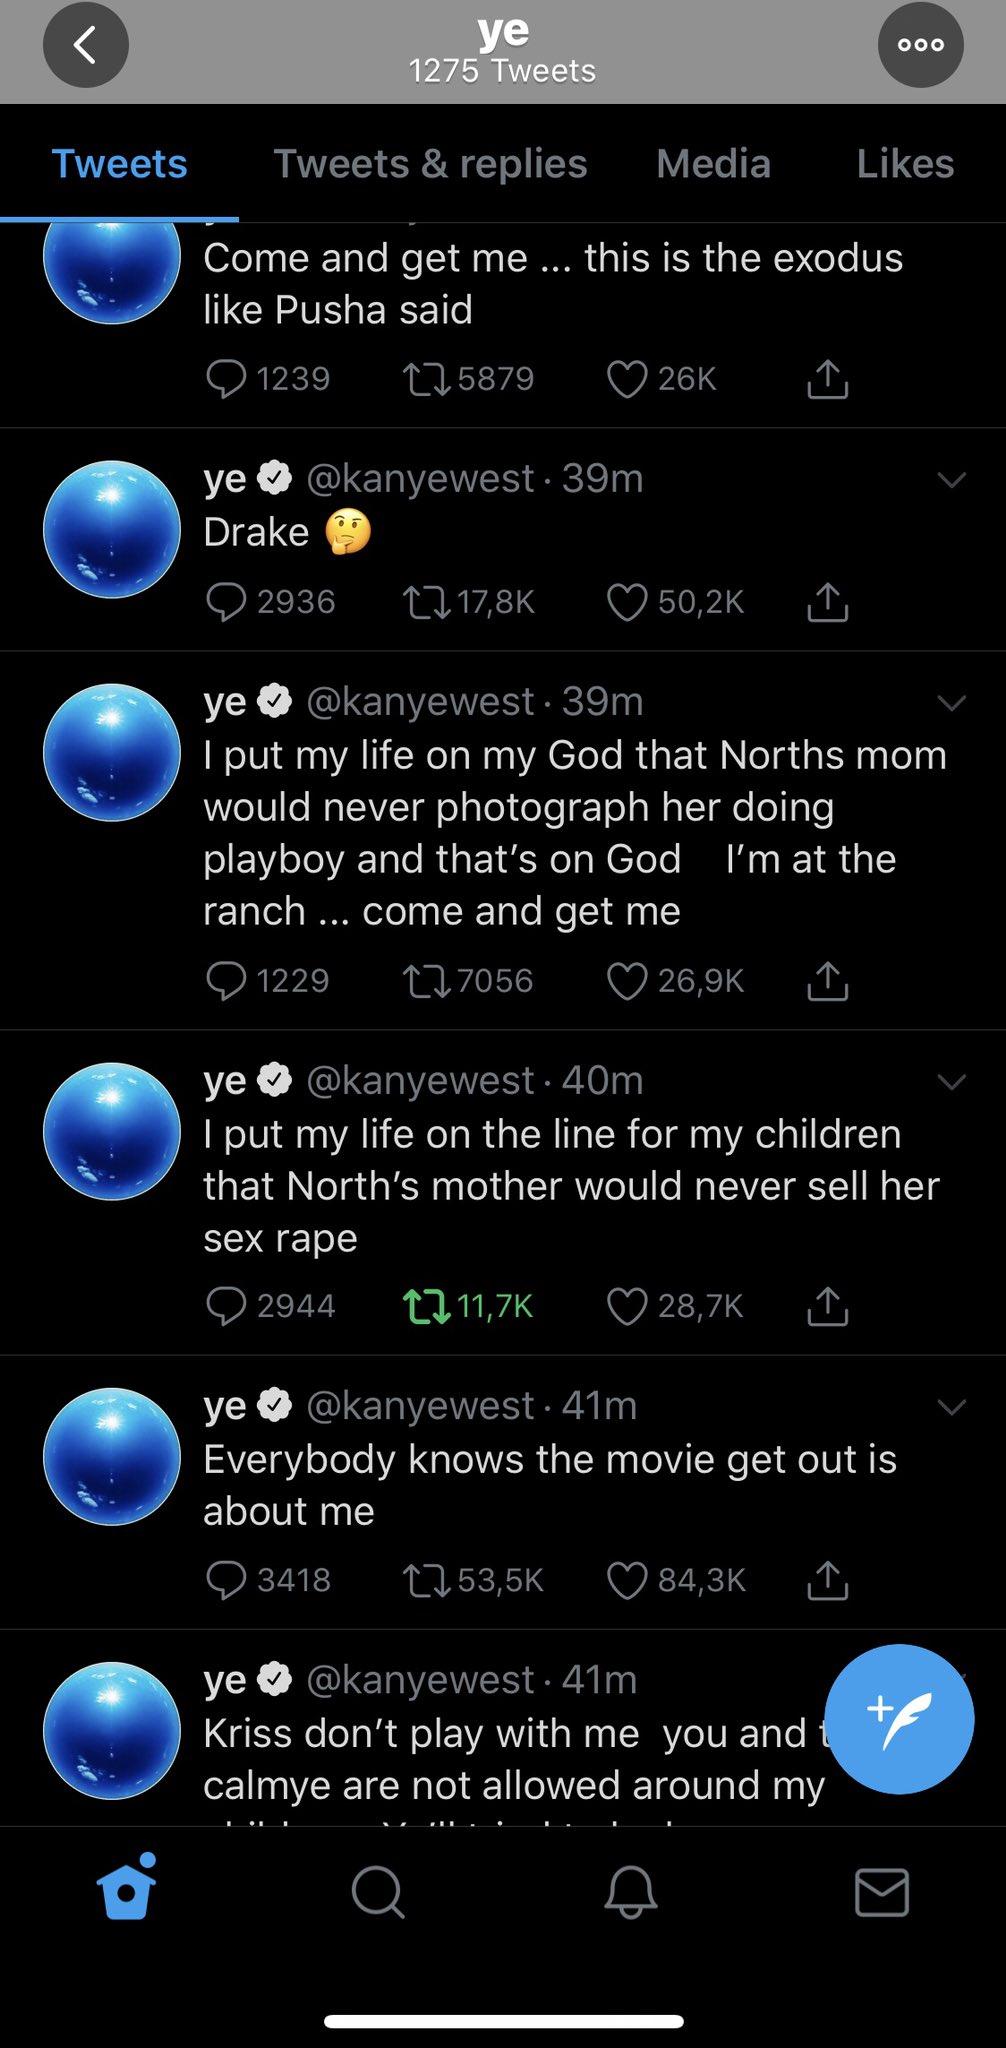 Kanye West Tweet / Kim lock up